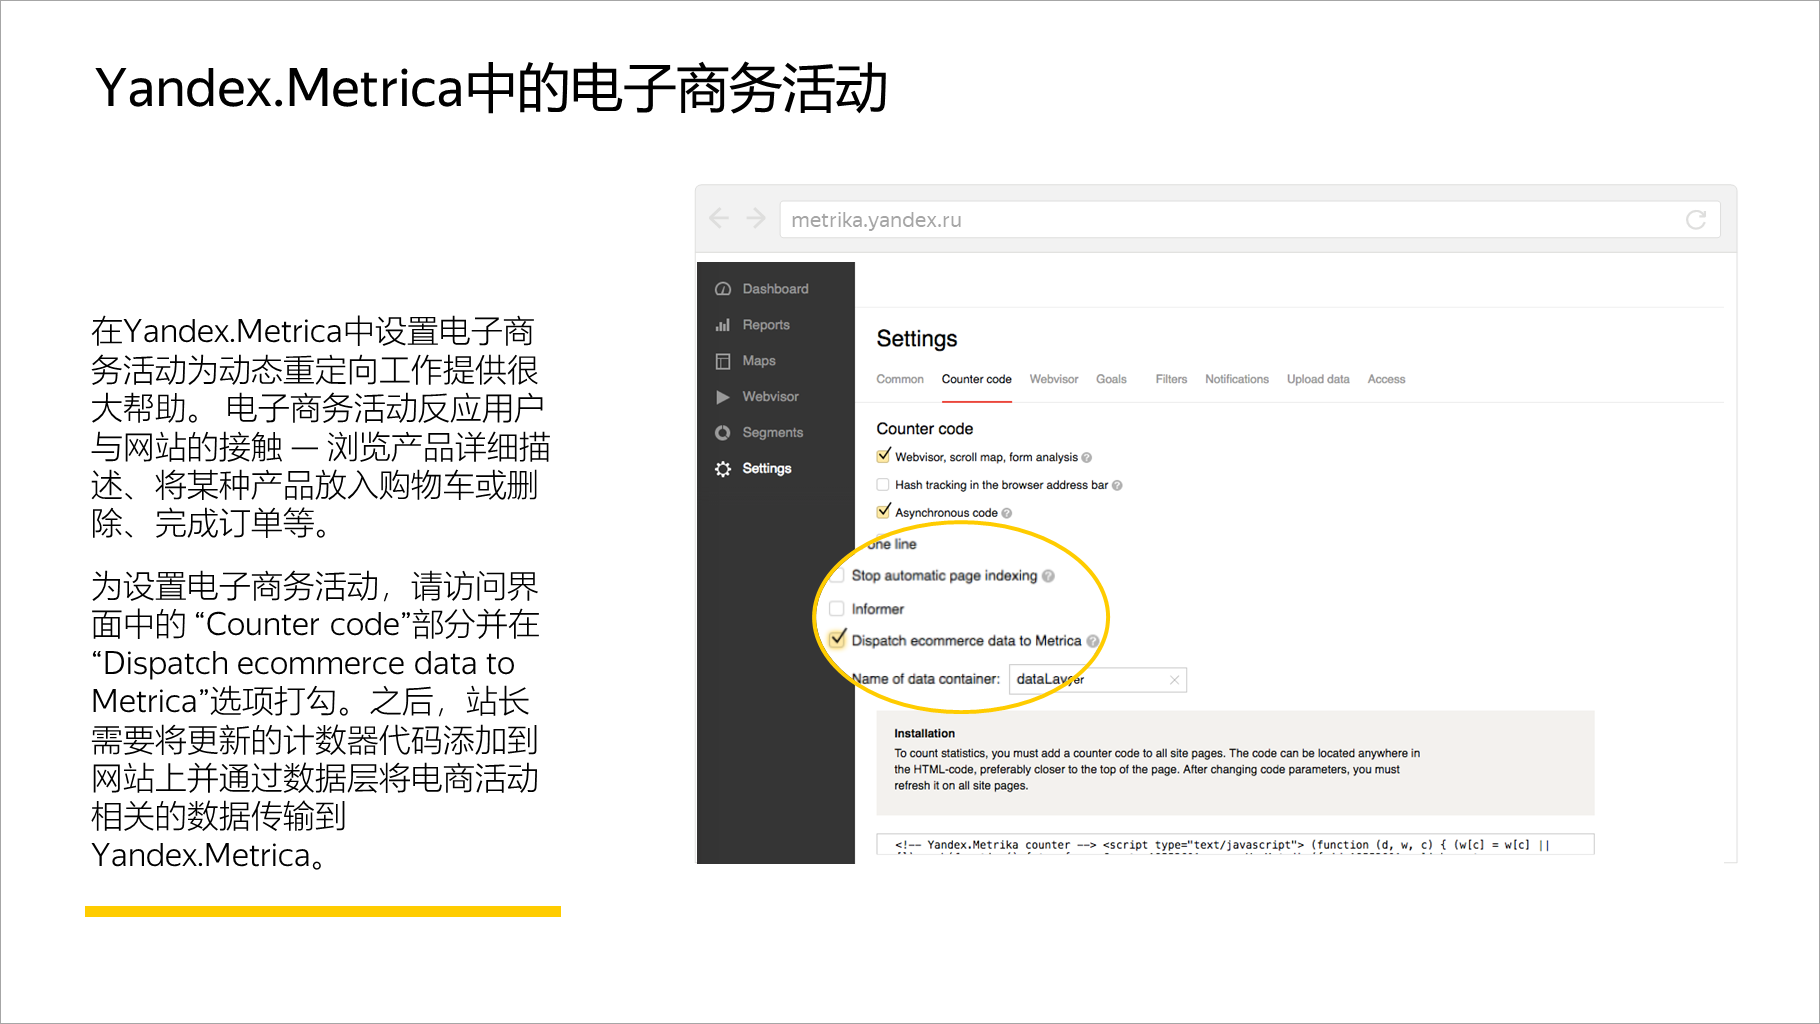 Yandex.Metrica中的电子商务活动